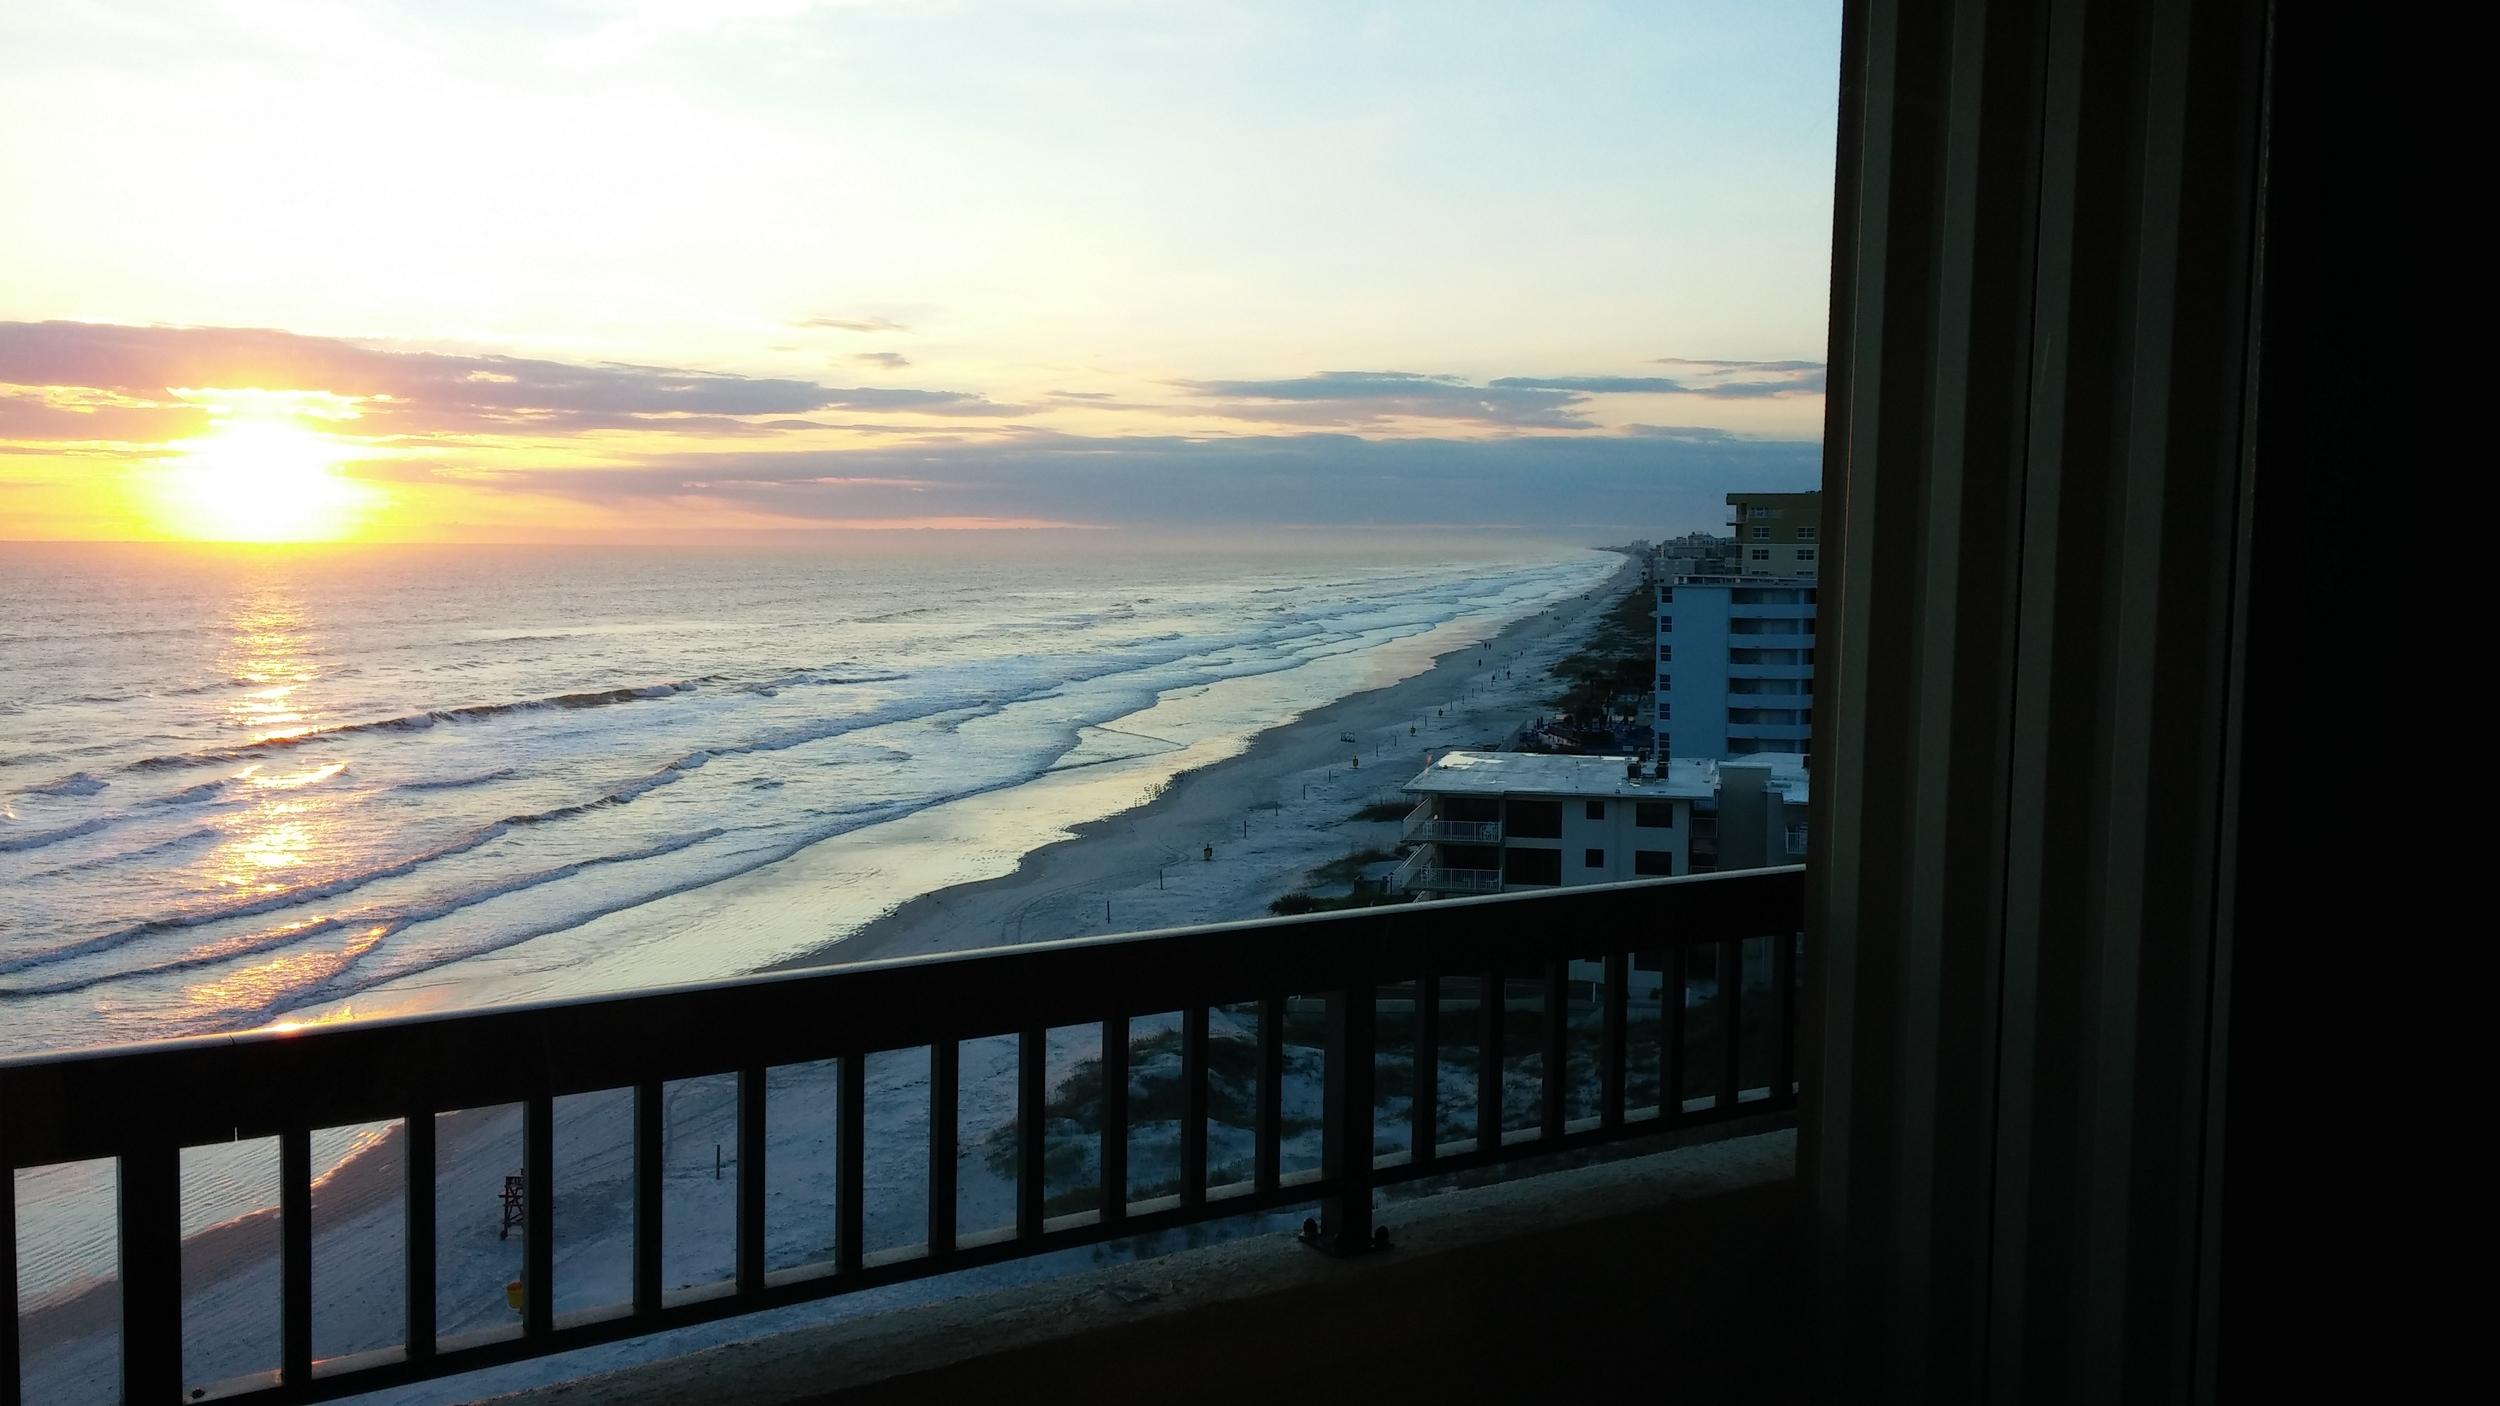 2016-01-11 Best Western New Smyrna Beach FL 13.jpg